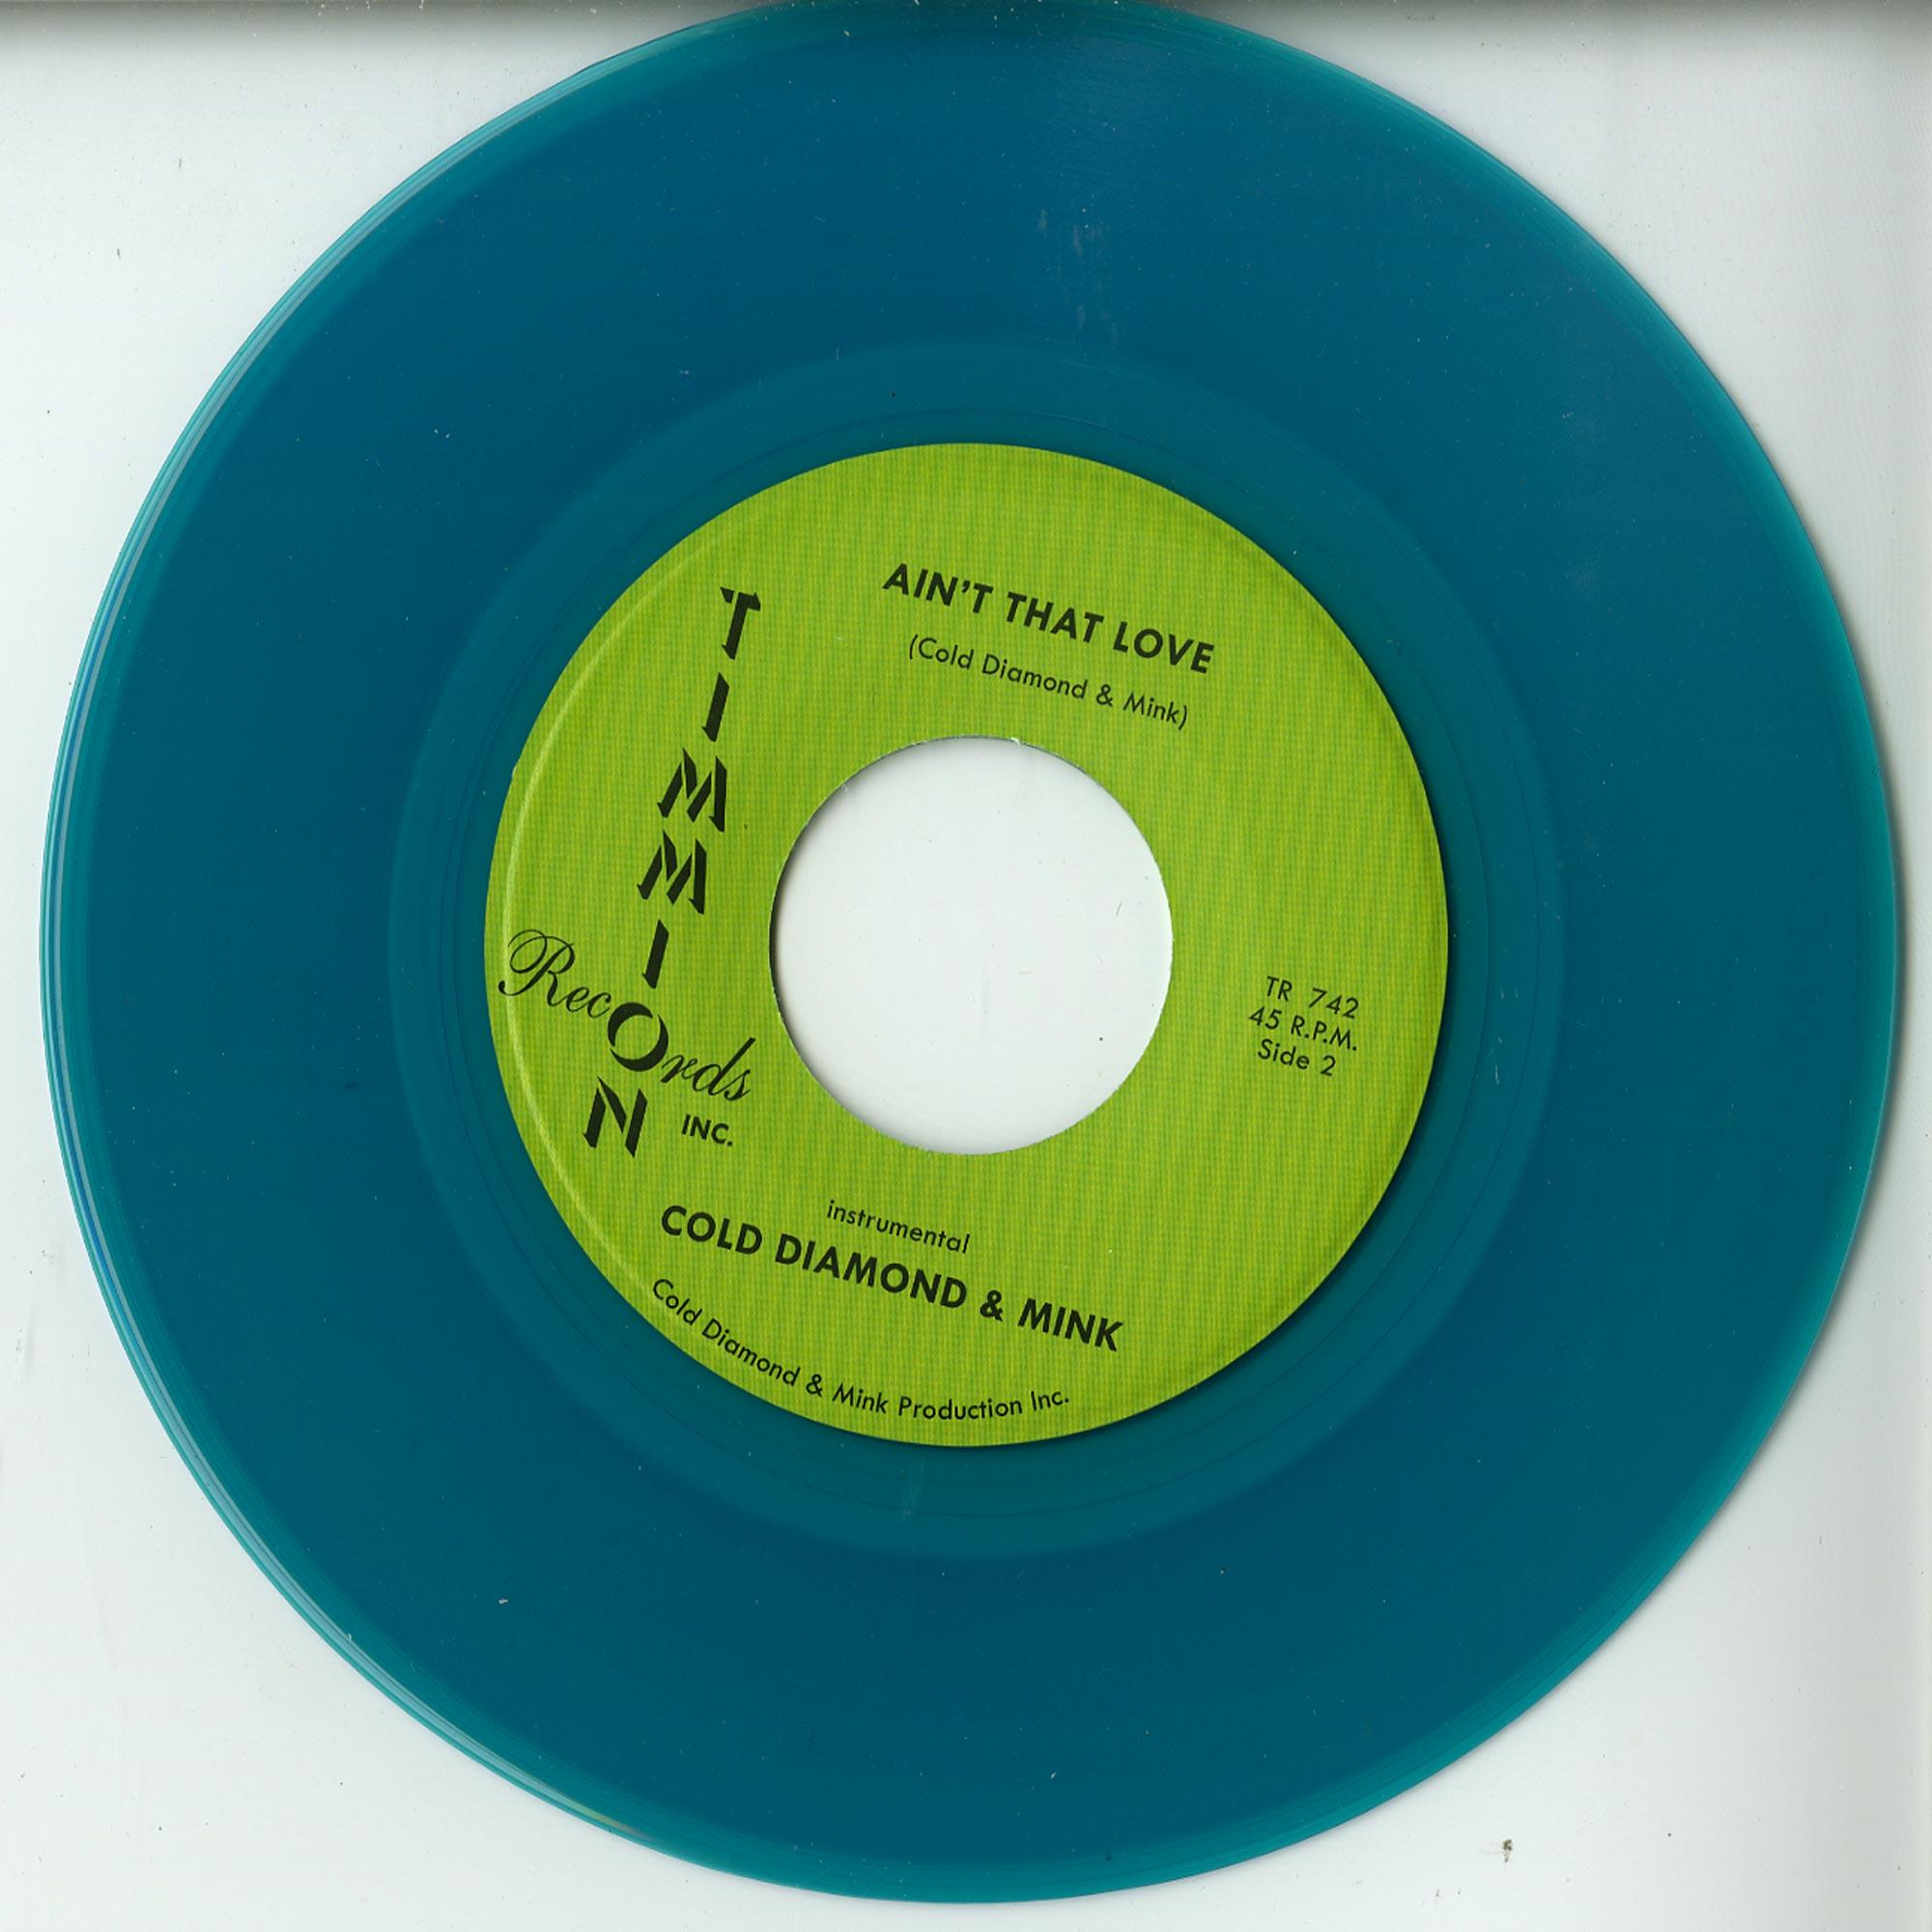 Carlton Jumel Smith ft. Cold Diamond & Mink - AINT THAT LOVE